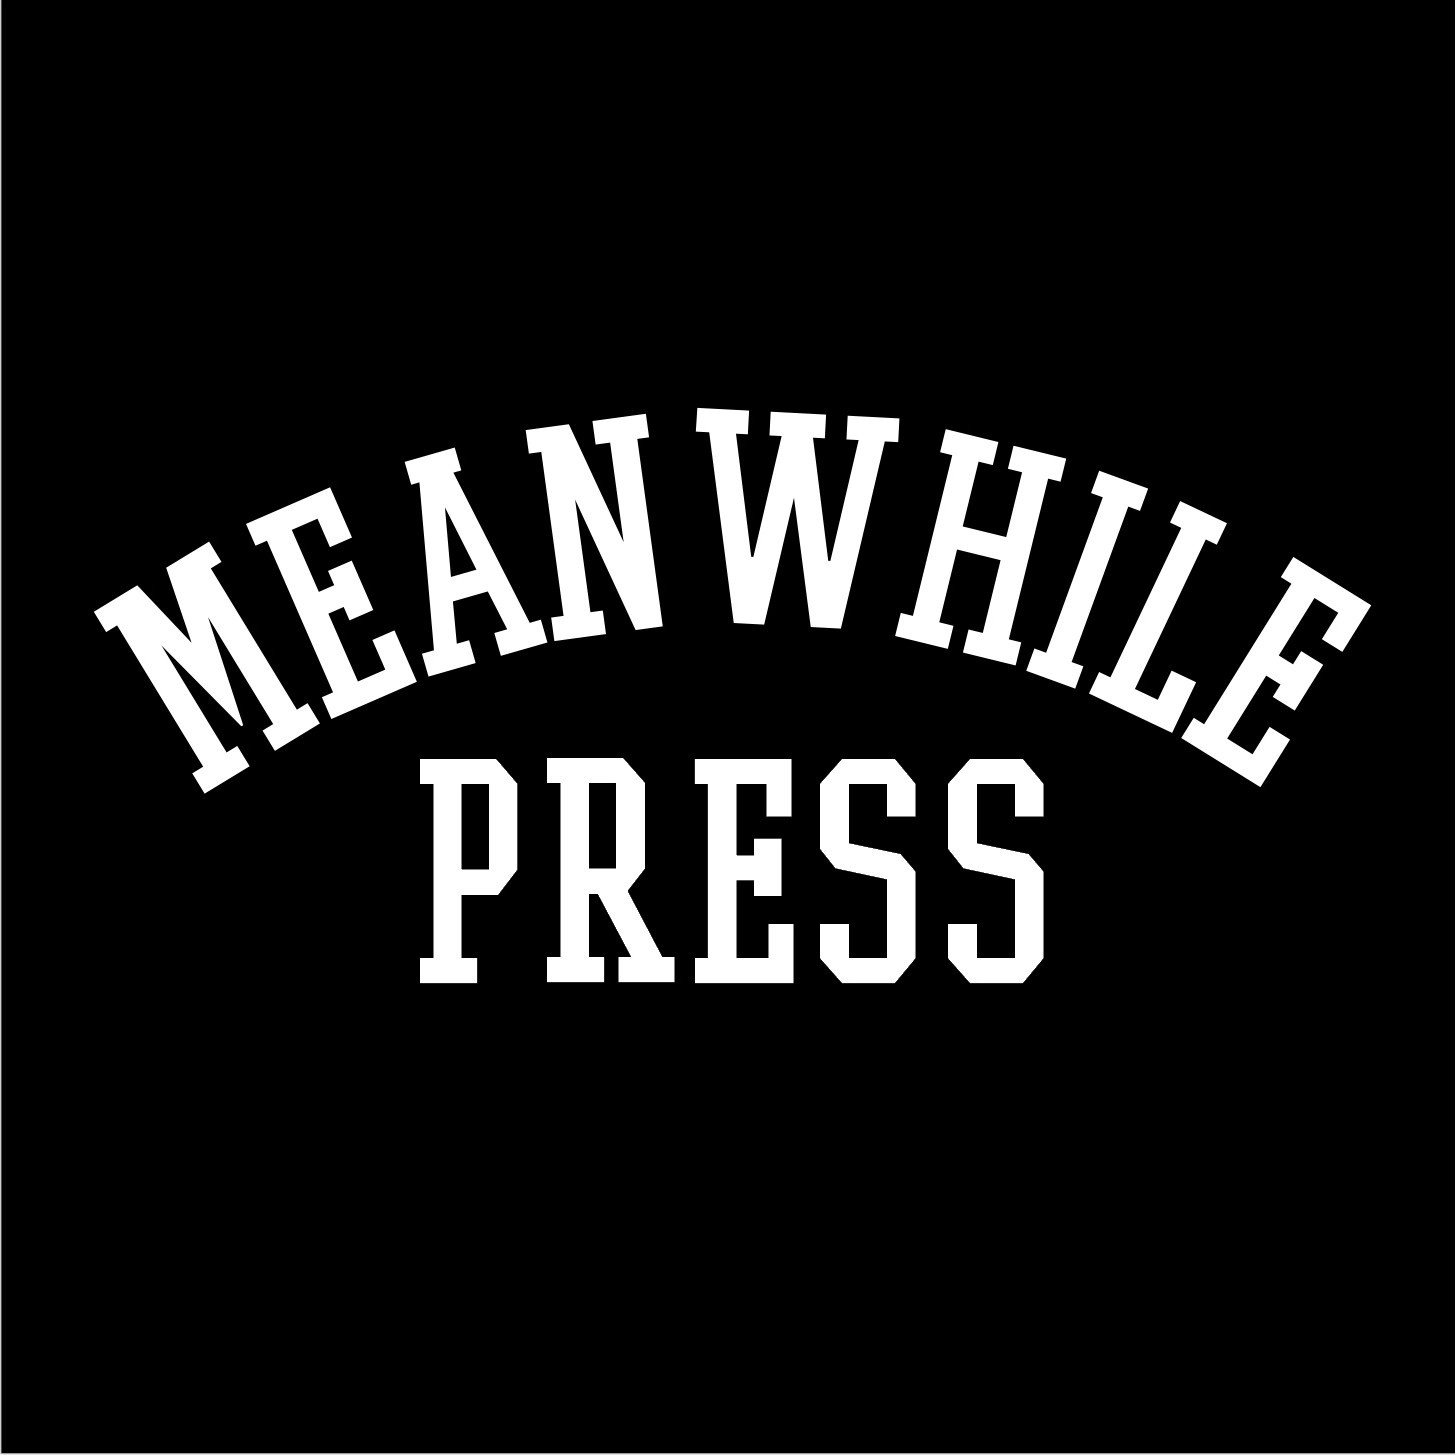 MEANWHILE PRESS